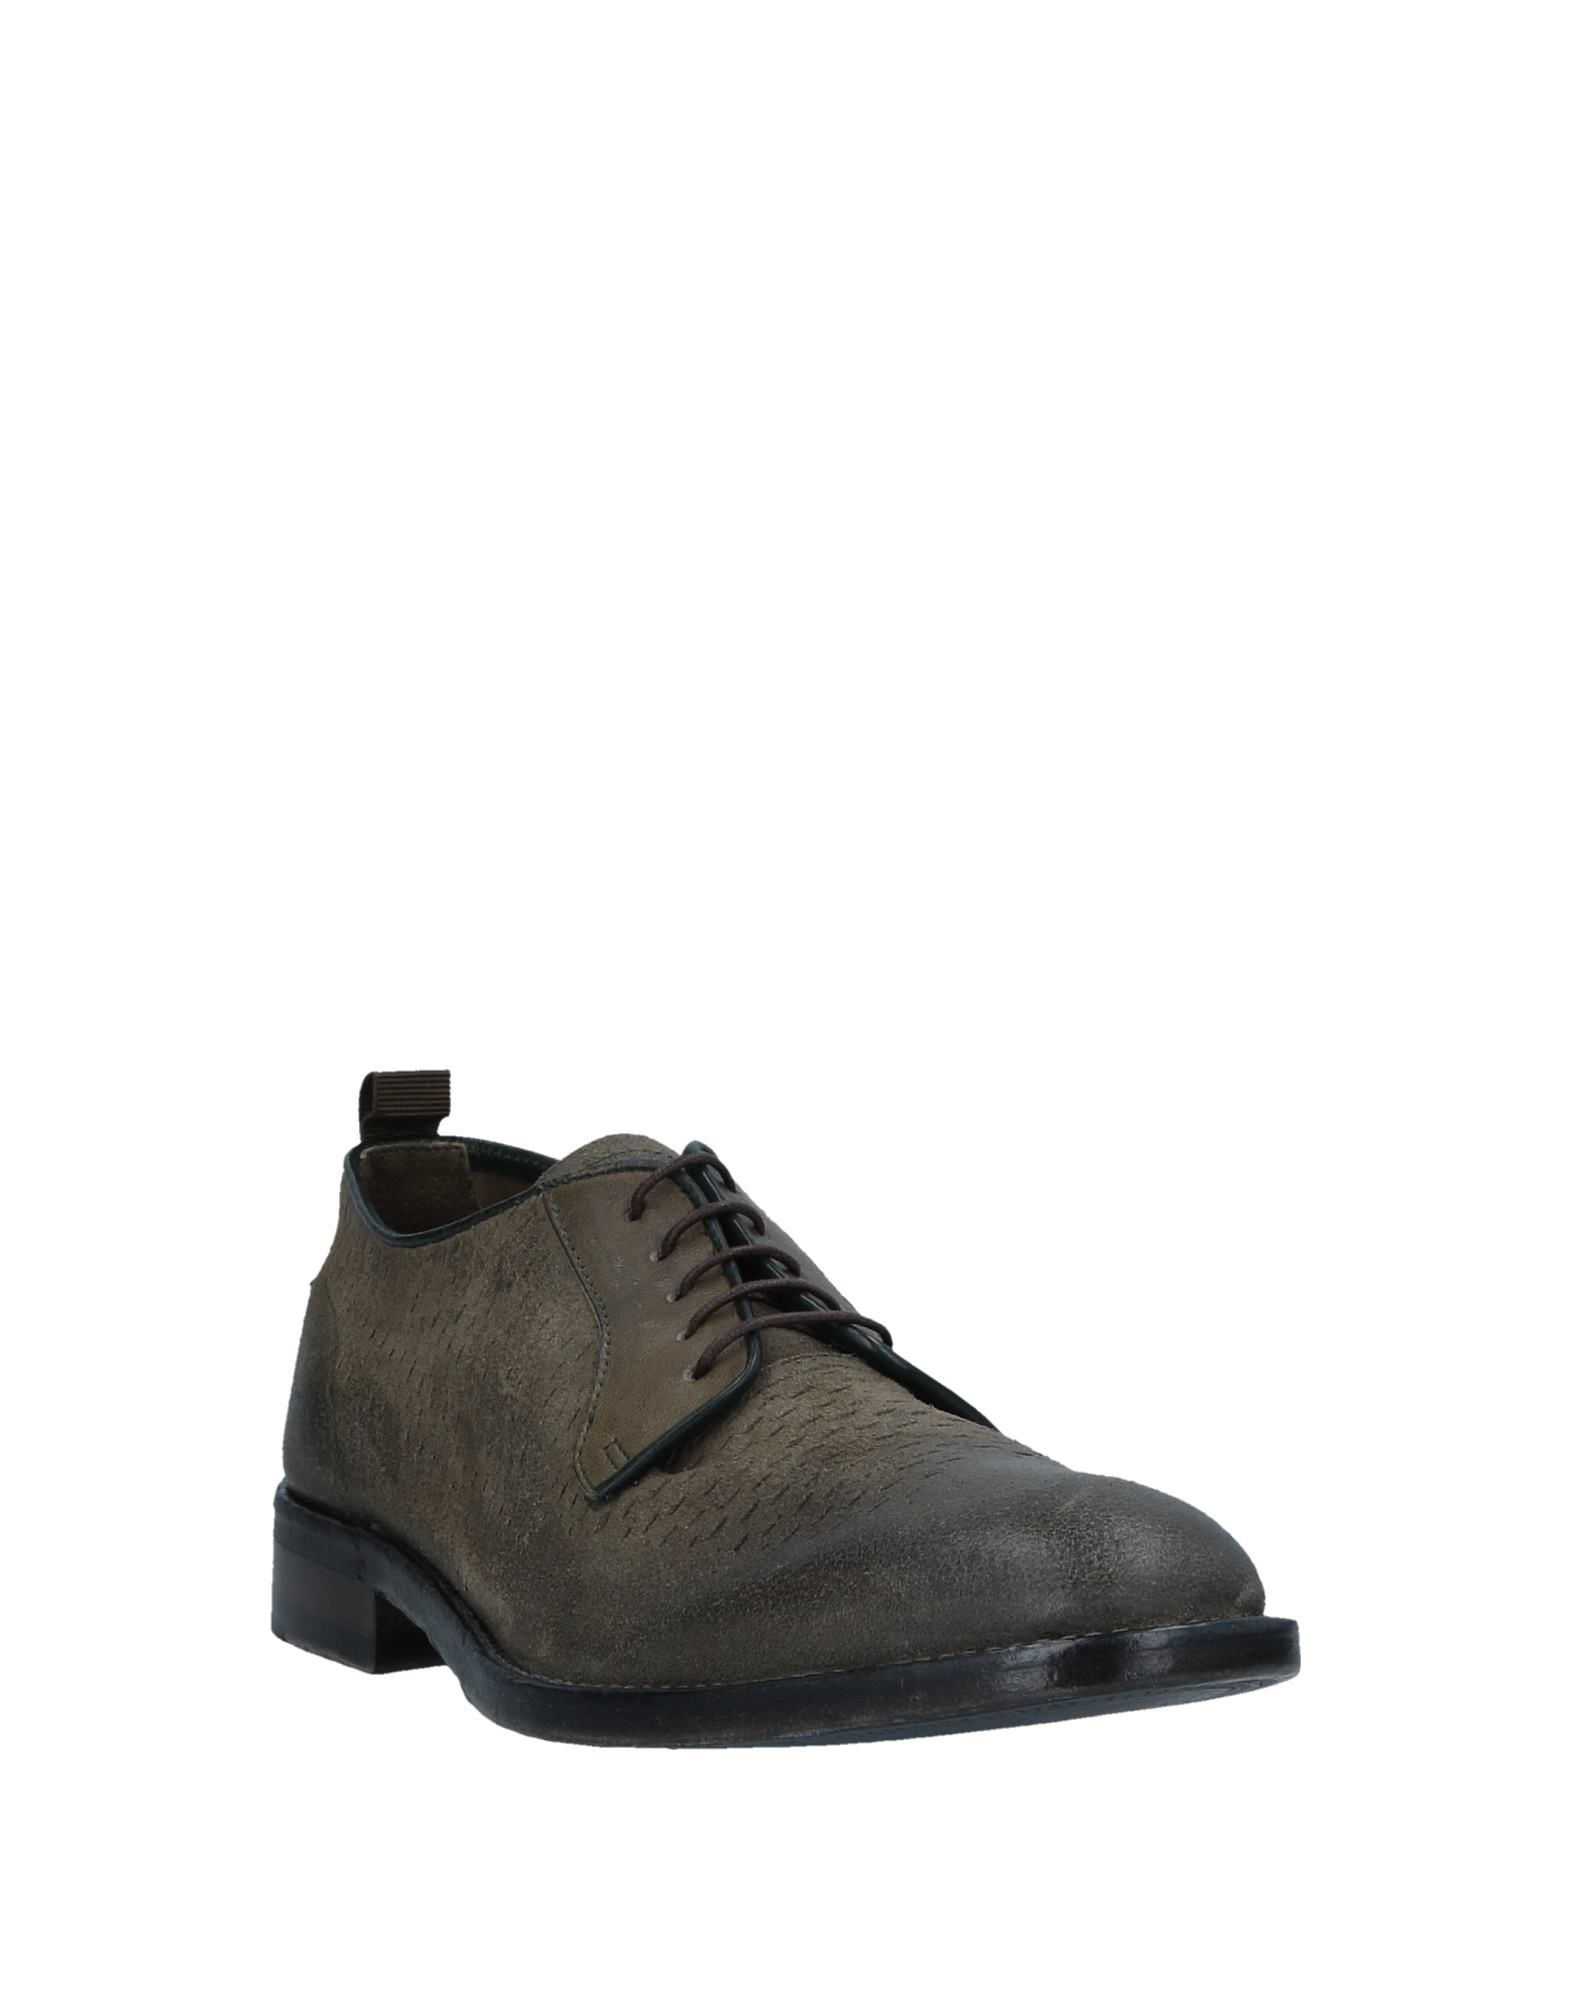 Barracuda Schnürschuhe Herren Heiße  11532744ML Heiße Herren Schuhe 0d8d50